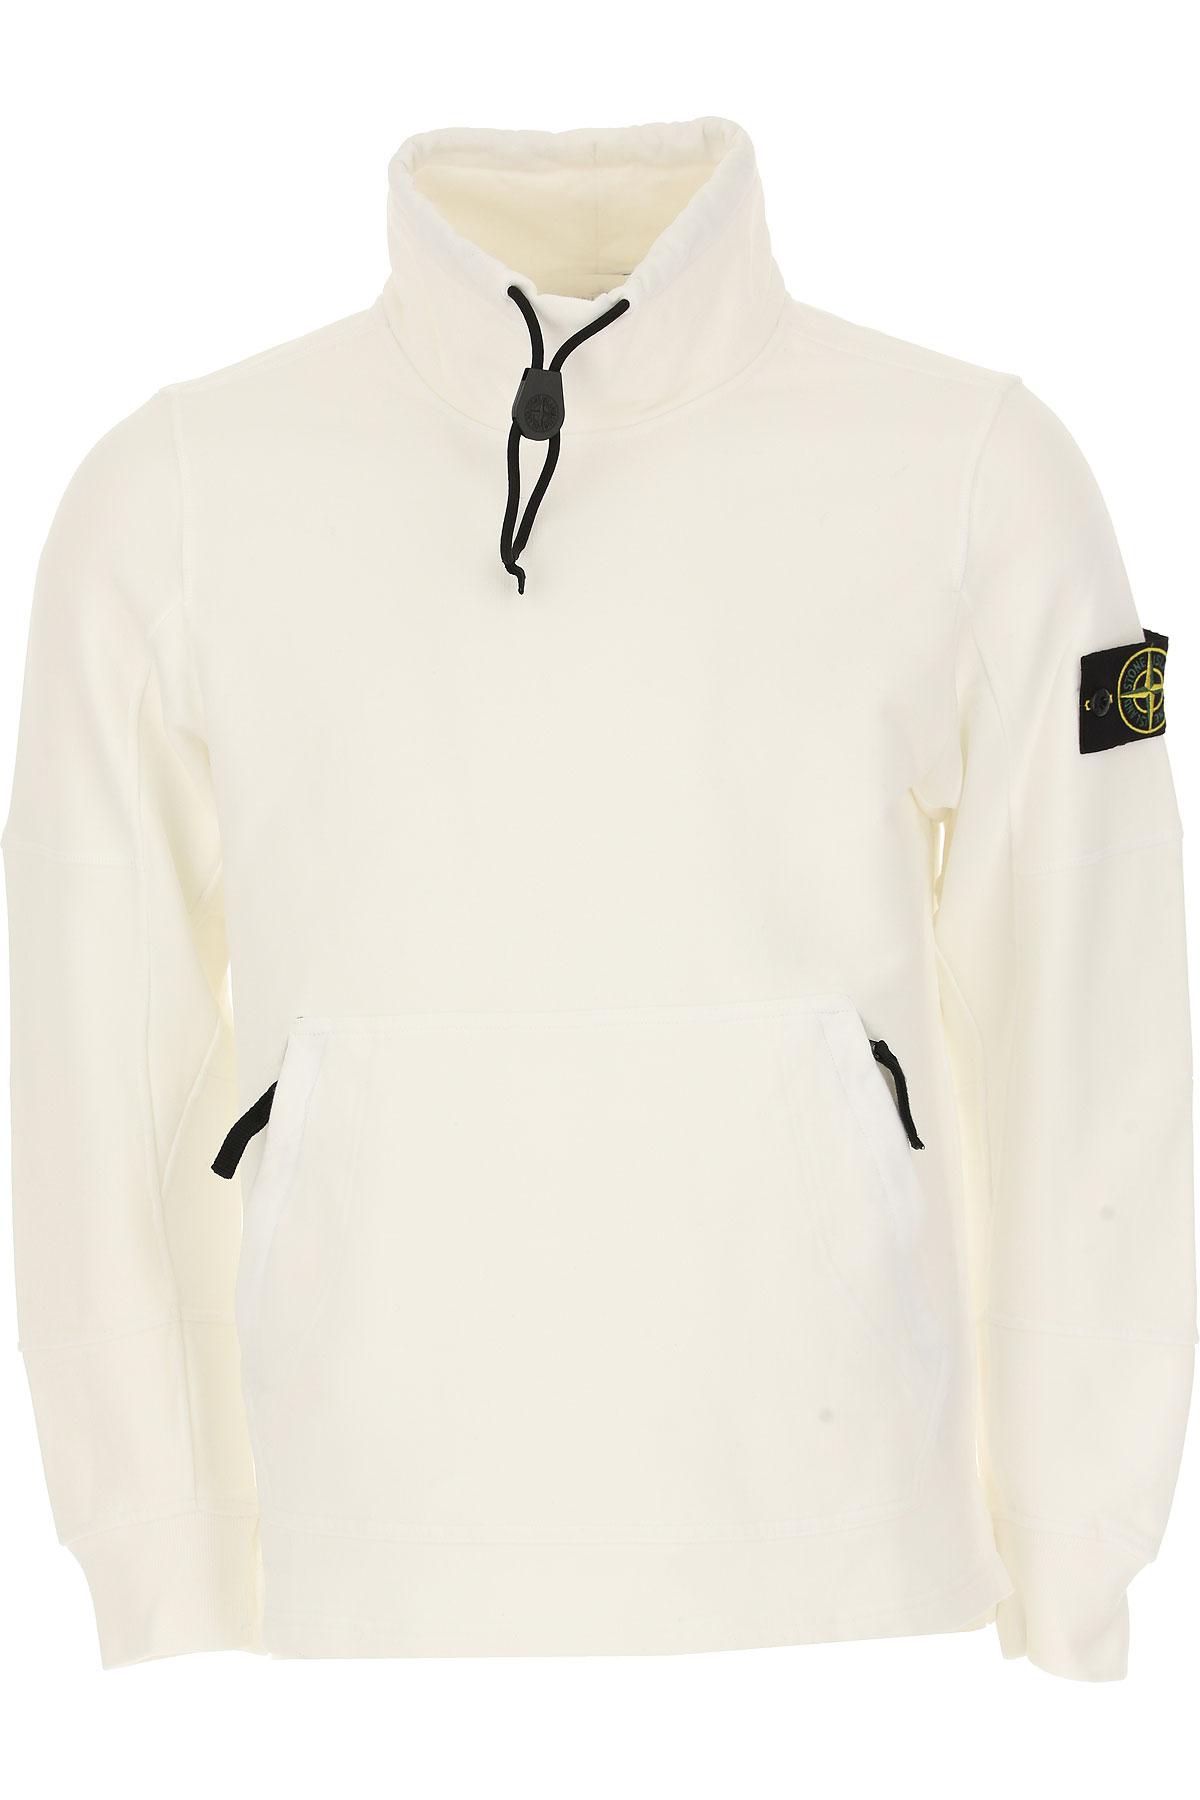 Stone Island Sweatshirt for Men, White, Cotton, 2017, L M S USA-468490